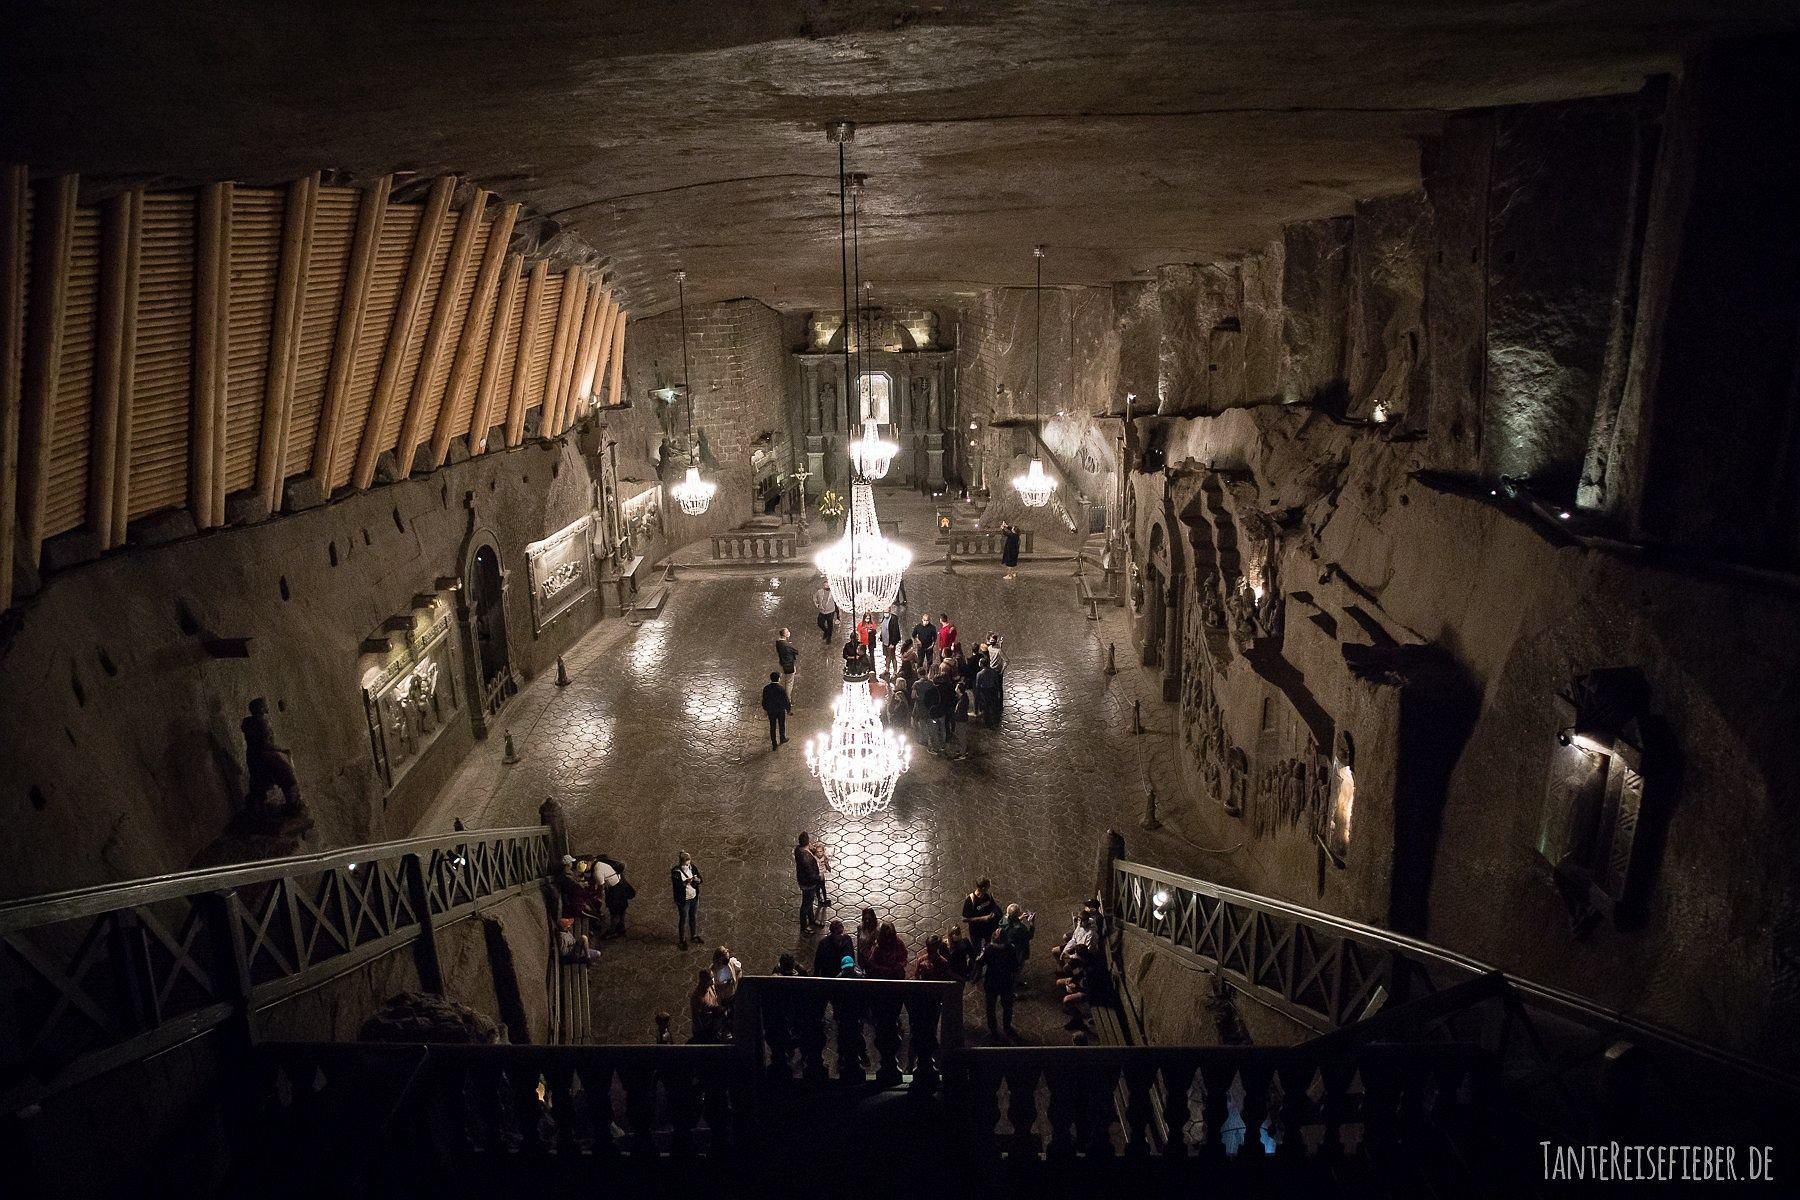 In die Tiefe: Salzmine Wieliczka bei Krakau